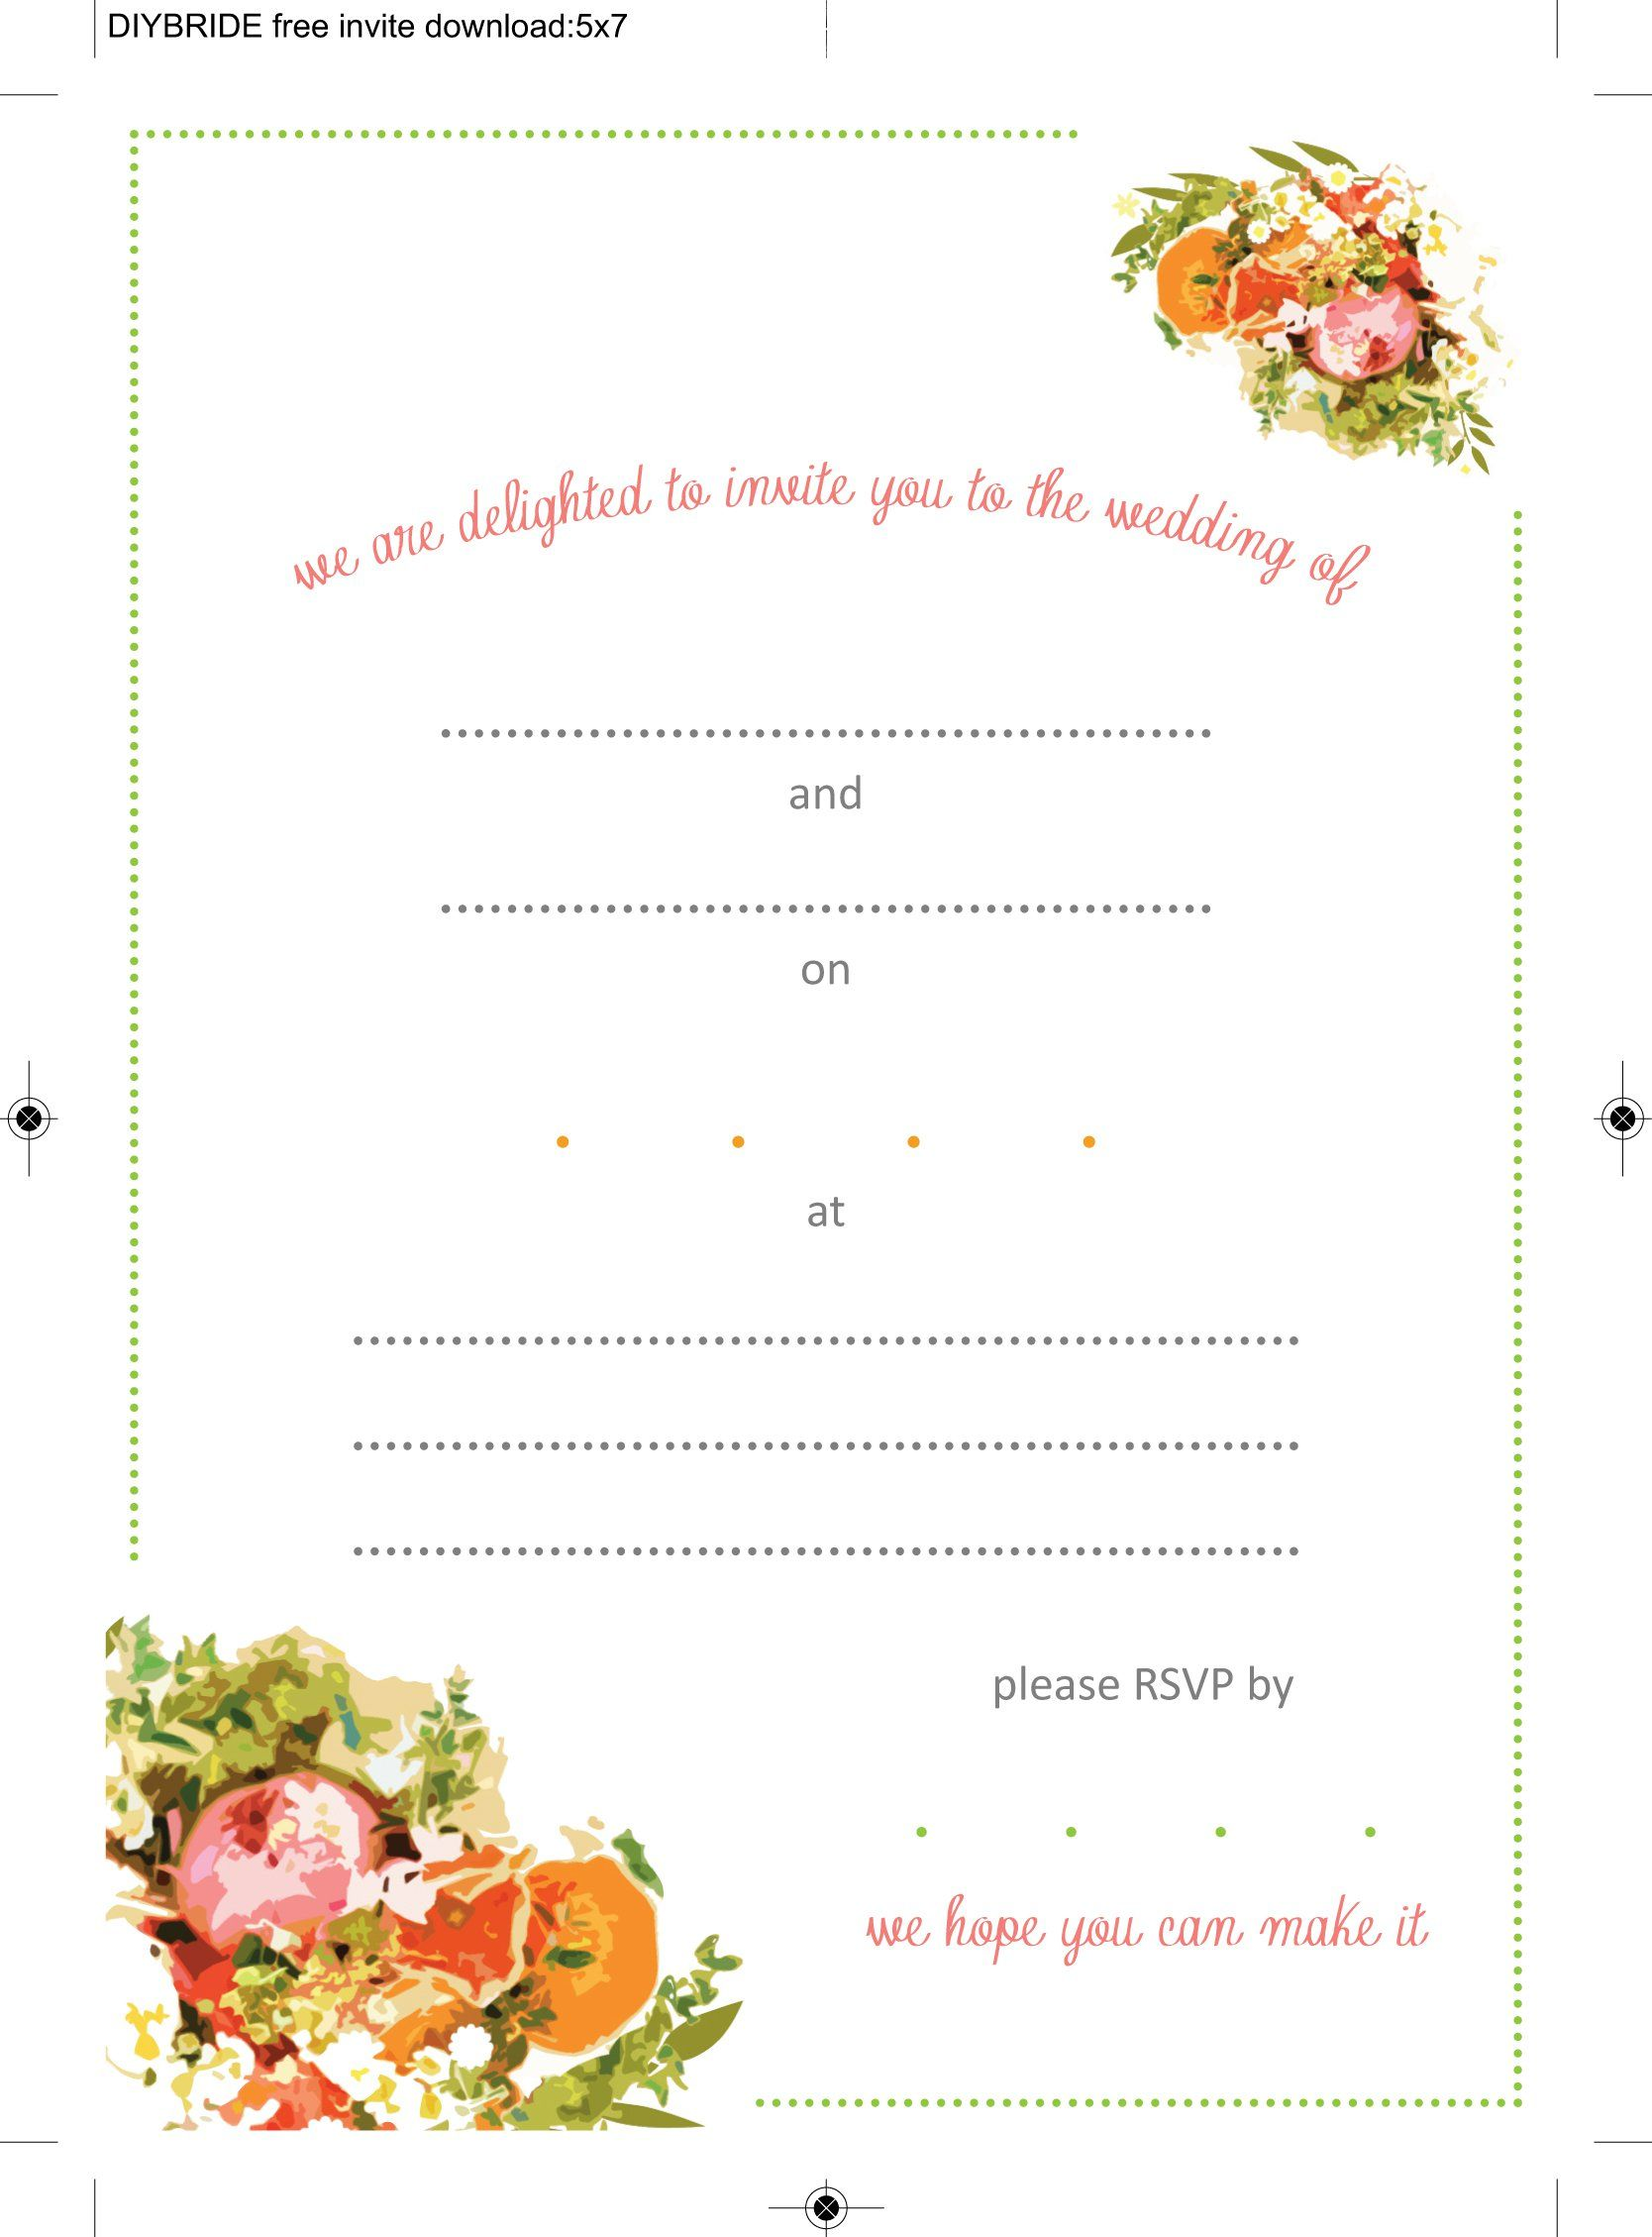 35 free printable wedding invitations free printable wedding 35 free printable wedding invitations monicamarmolfo Choice Image